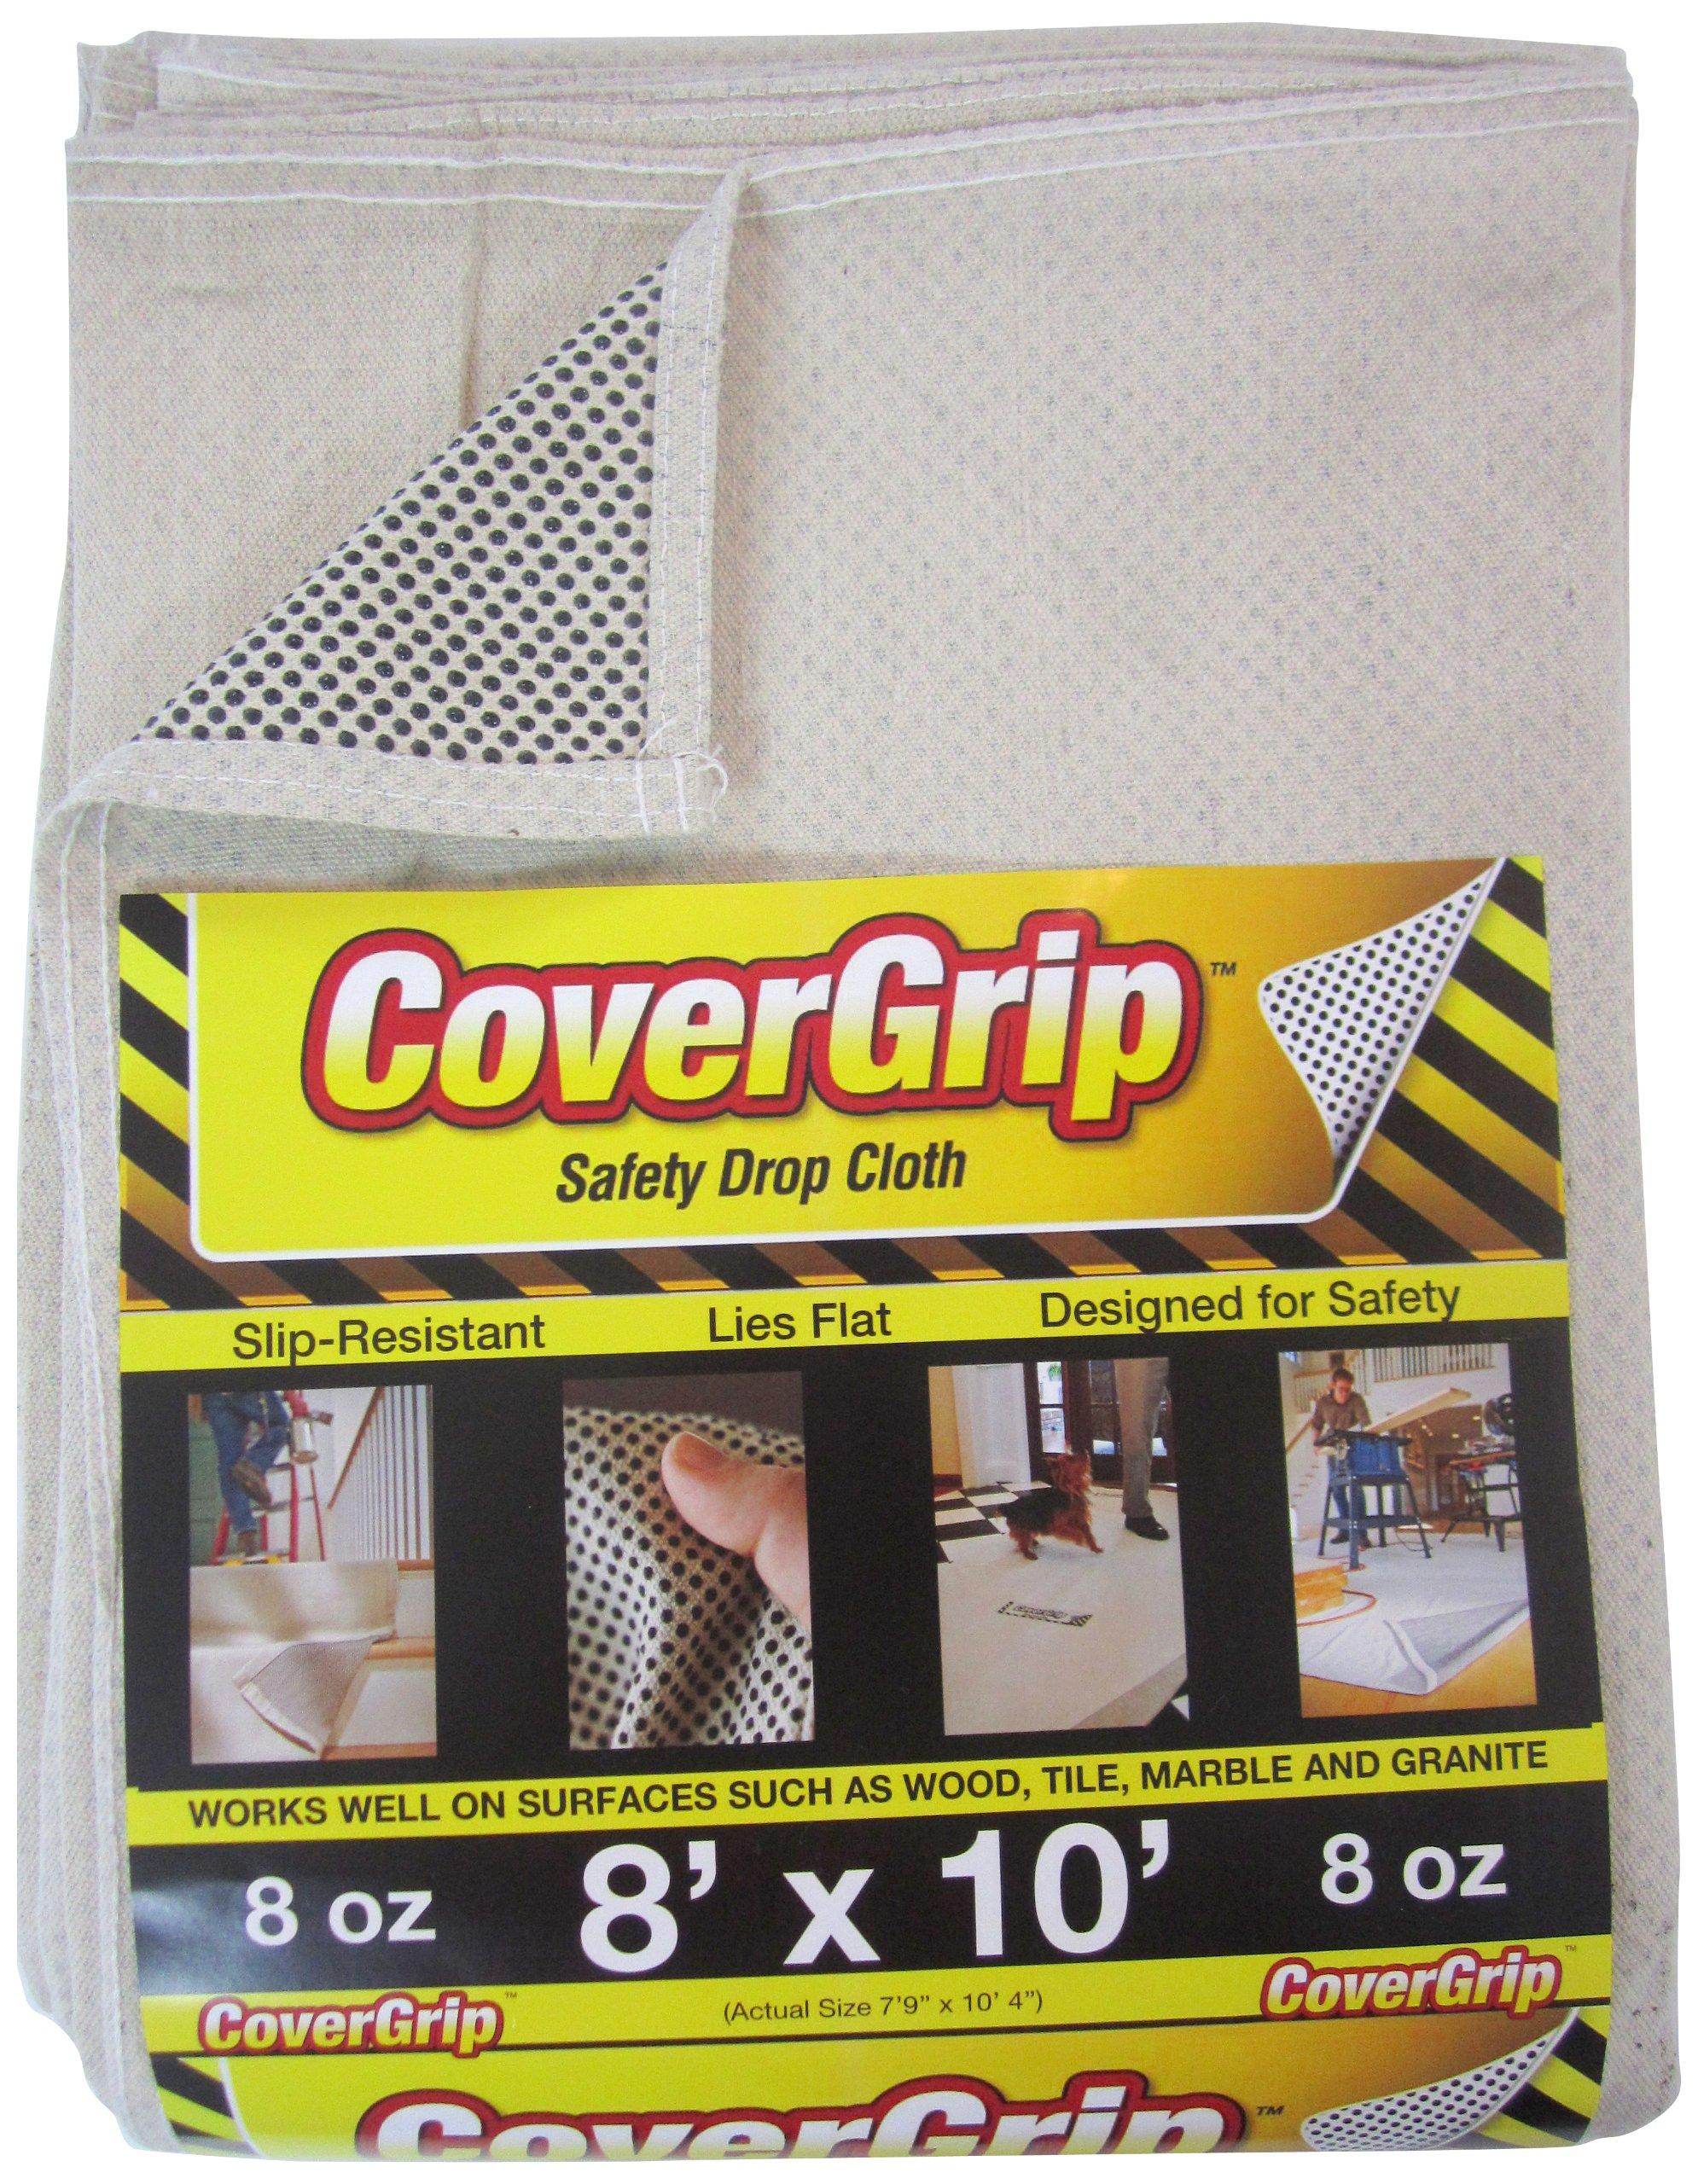 CoverGrip 081008 8oz 8' x10' Drop Cloth, 8' x 10', Off Off White